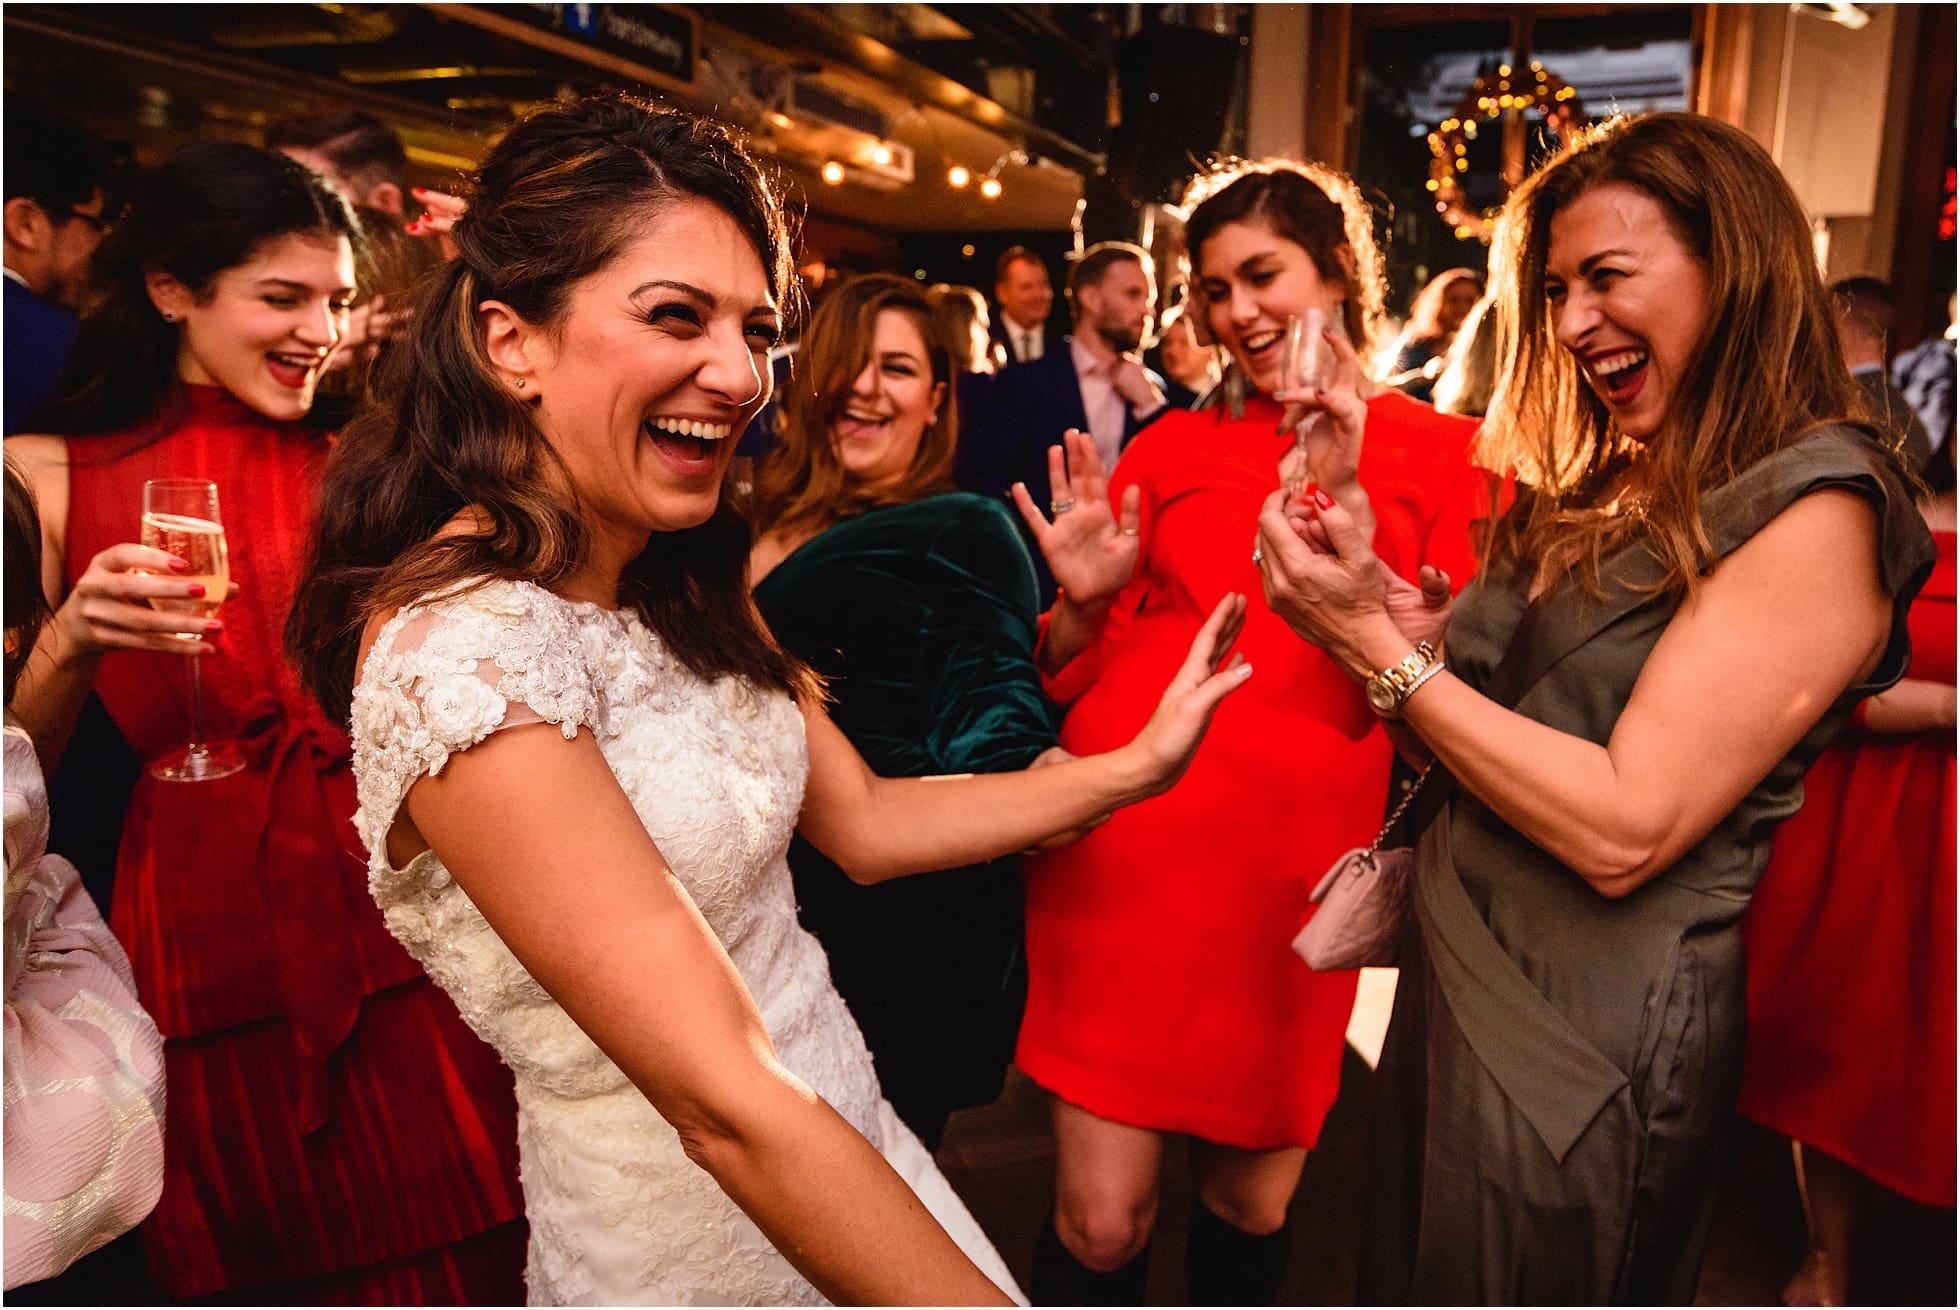 st bart's brewery wedding photographer shot of reception dancing